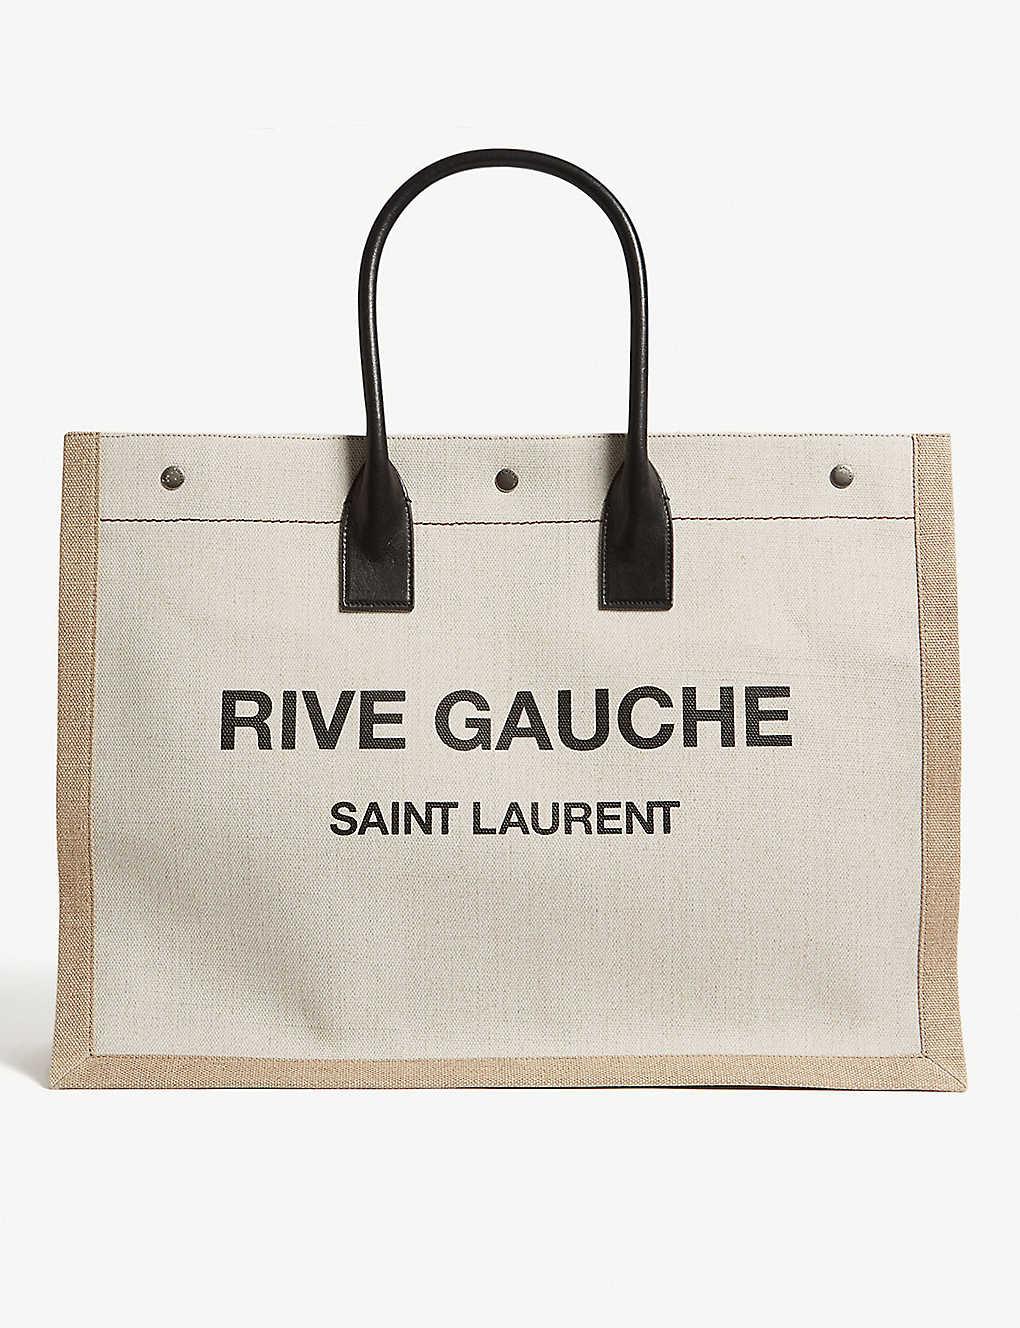 353fd0bb8 SAINT LAURENT - Rive Gauche canvas tote bag | Selfridges.com